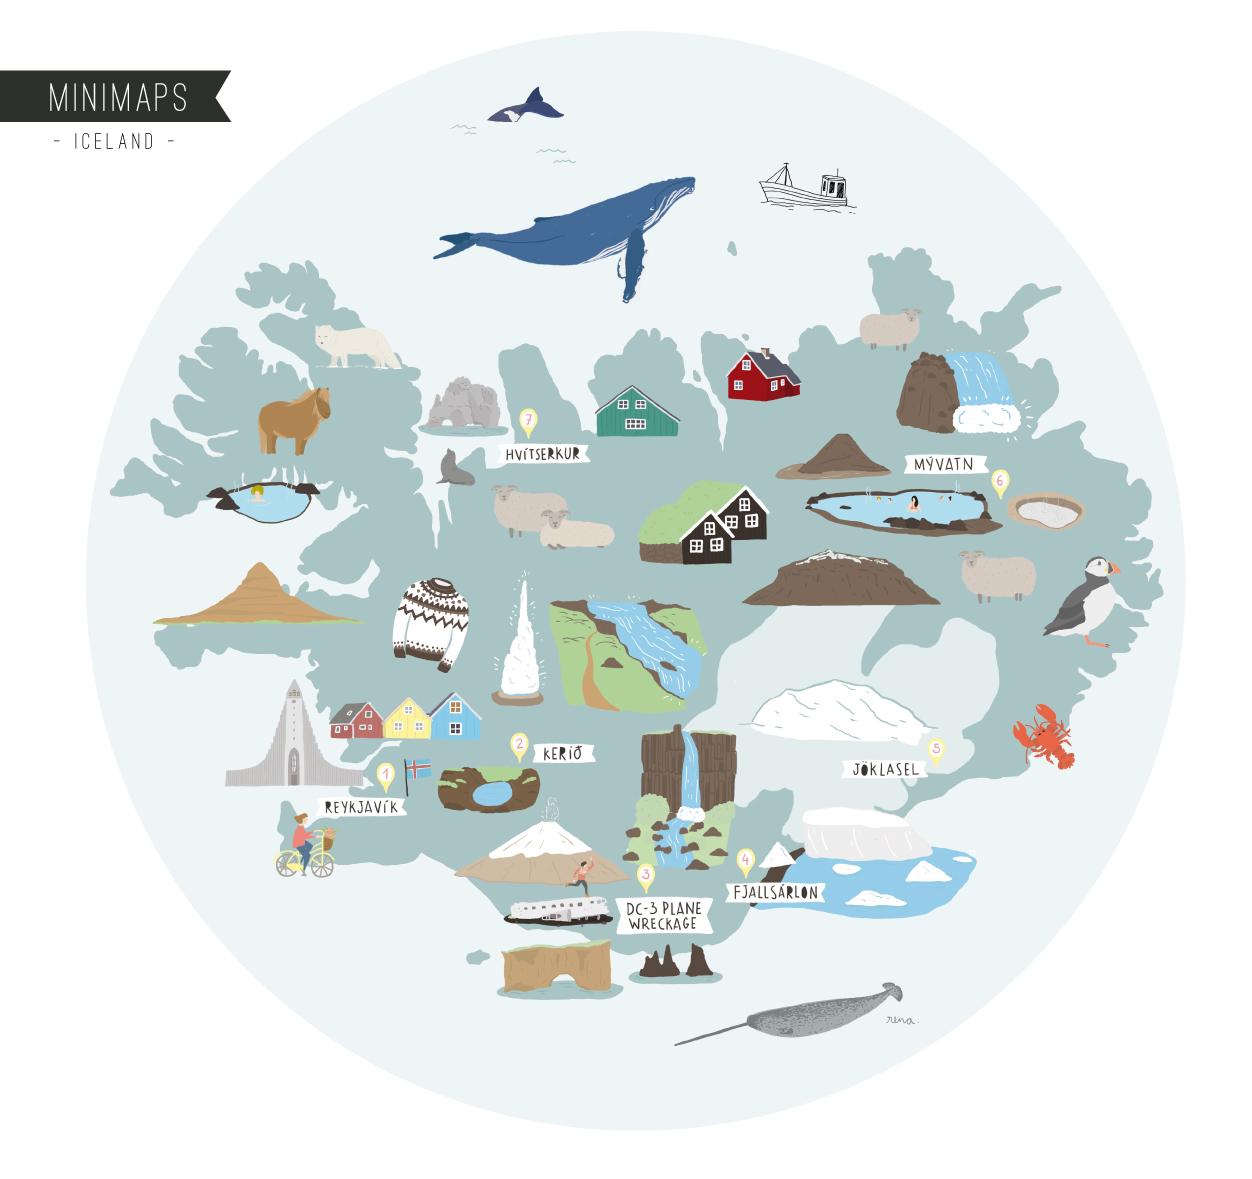 Iceland Magic Journey Minimap. See more: superminimaps.com